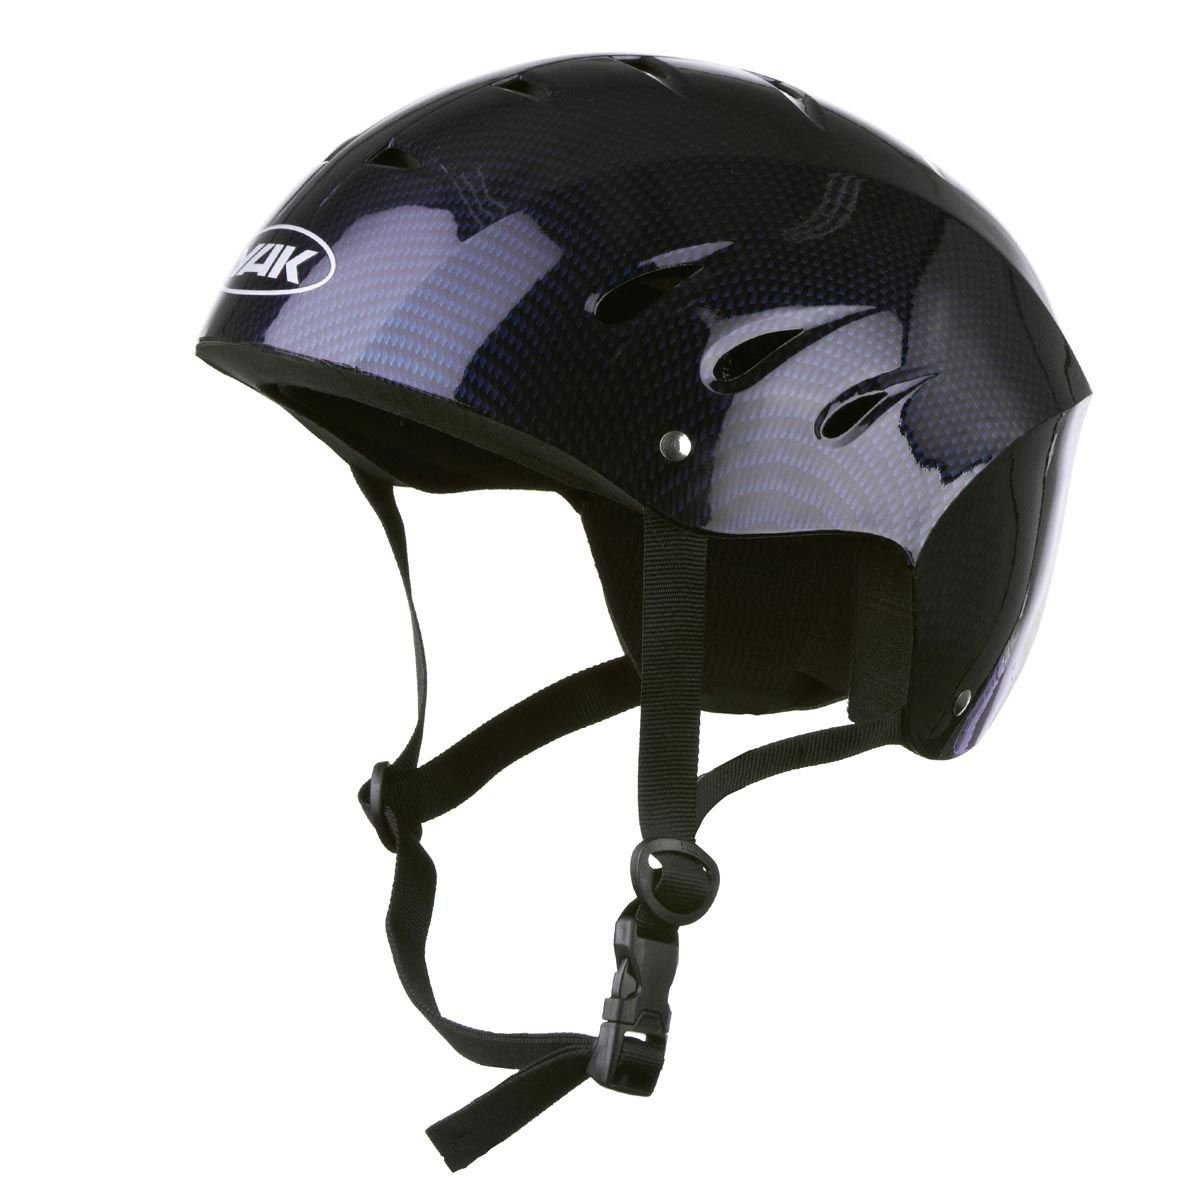 Yak Kontour Helmet 6253 - Kevlar Blue